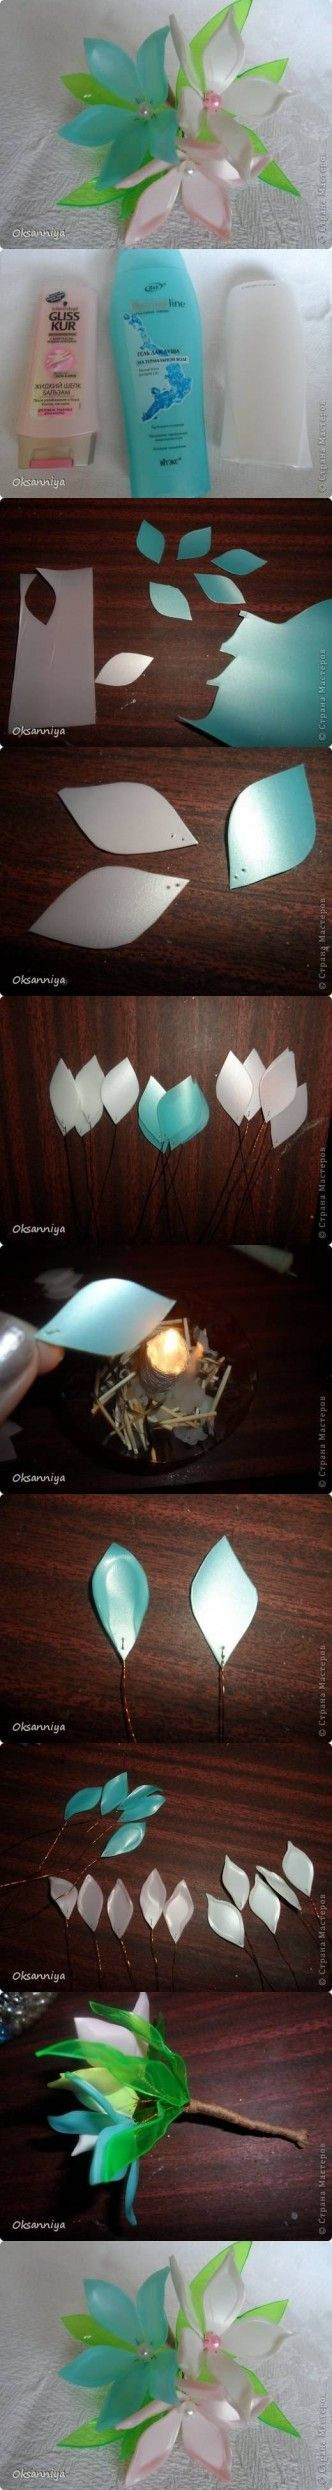 DIY Plastic Bottle Flower Bunch DIY Projects